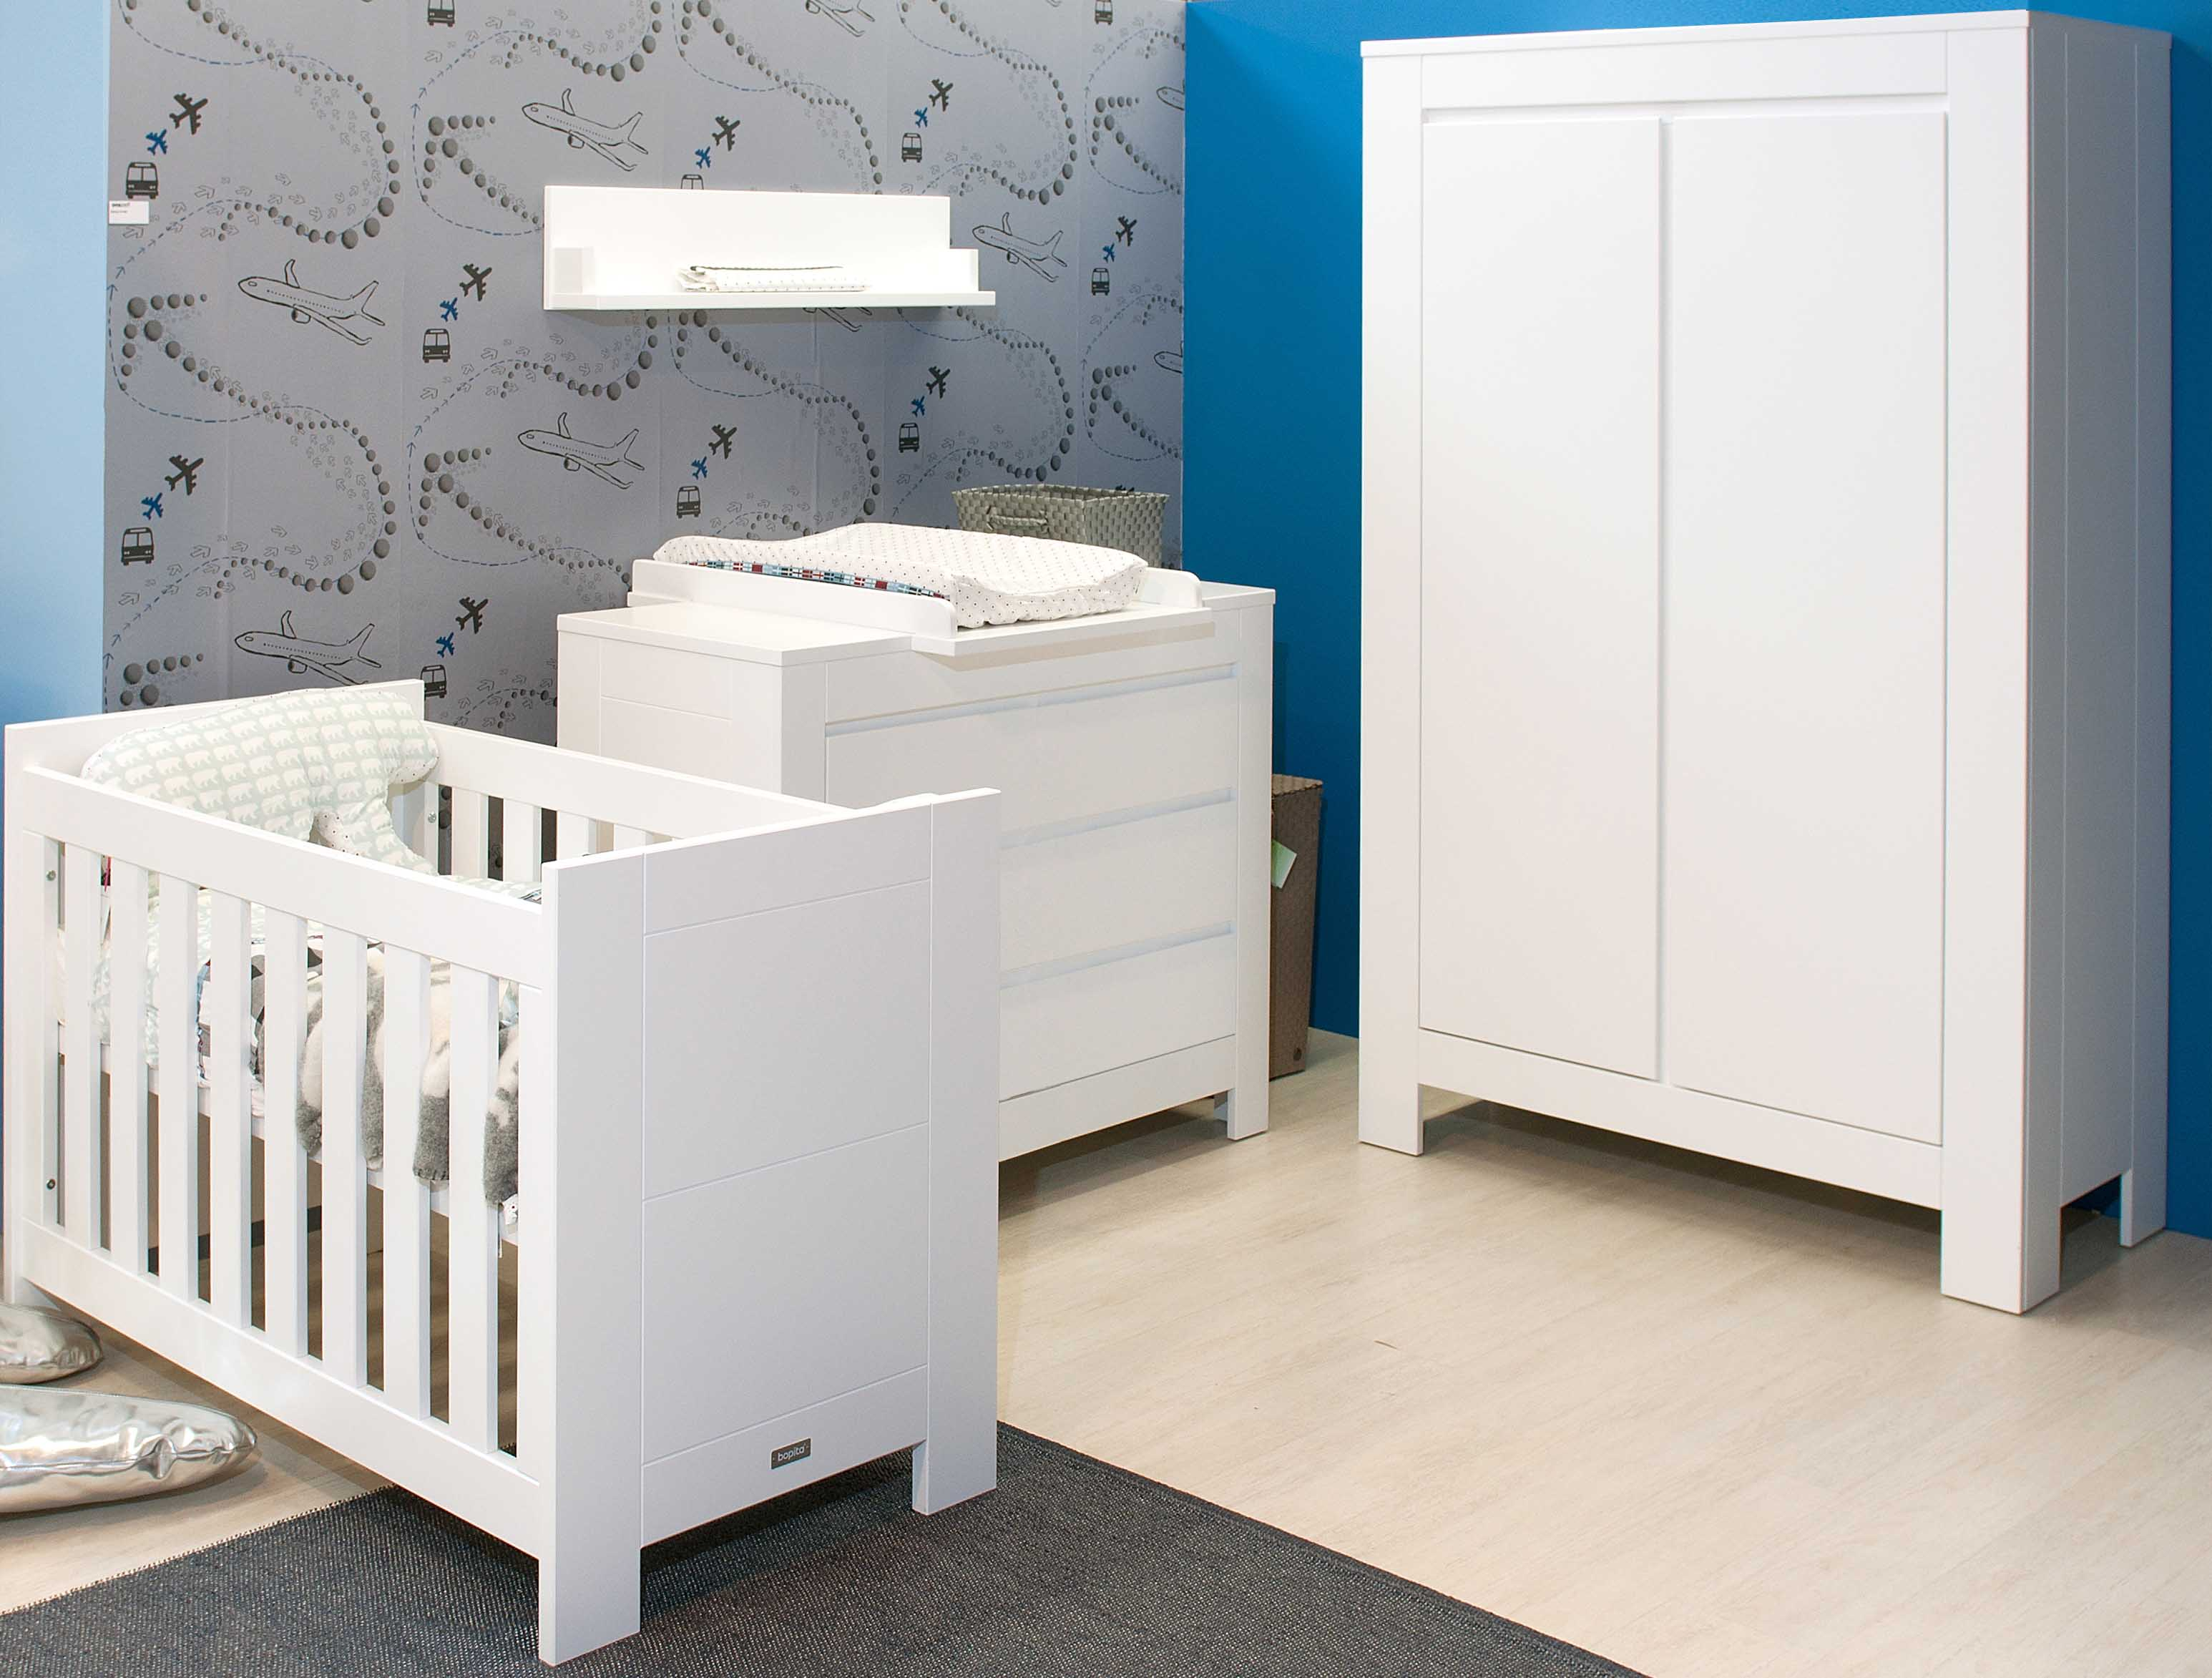 Bopita basic wood tienerkamer interieurs de meubelberg - Modern bed volwassen ...